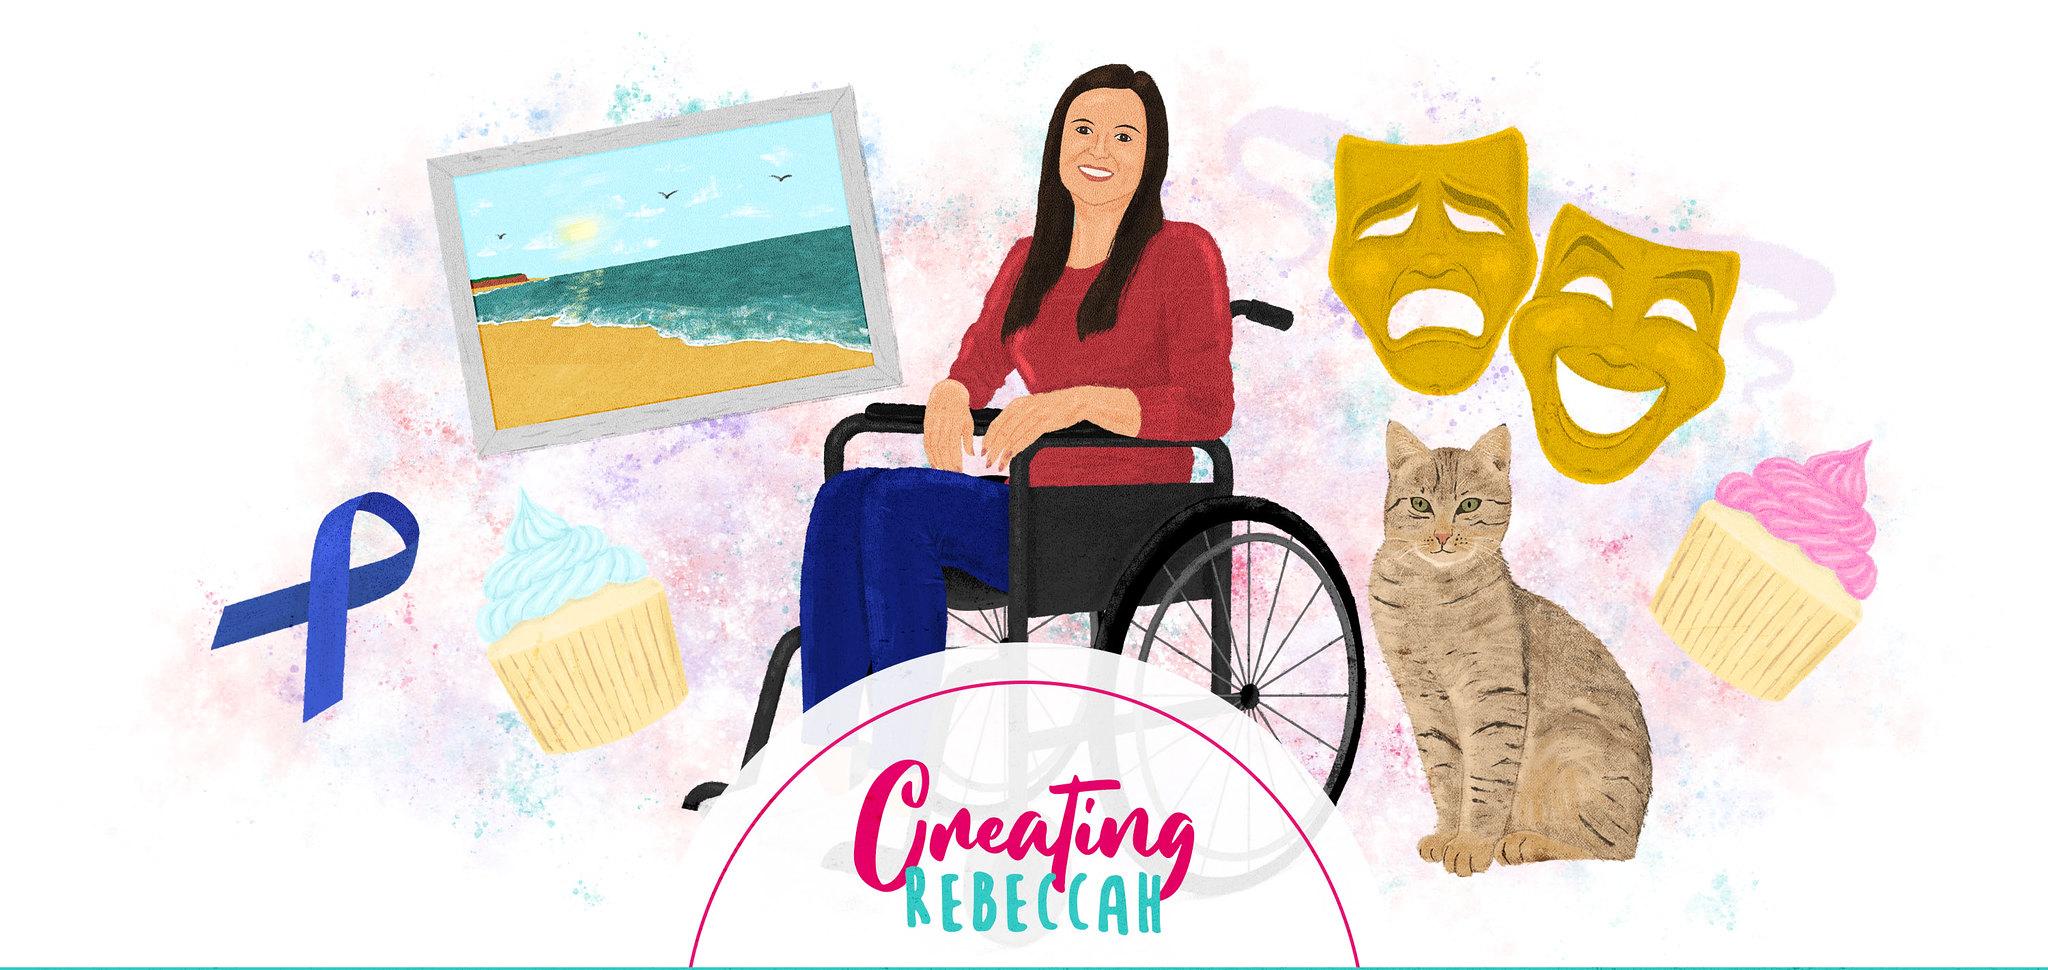 Creating Rebeccah